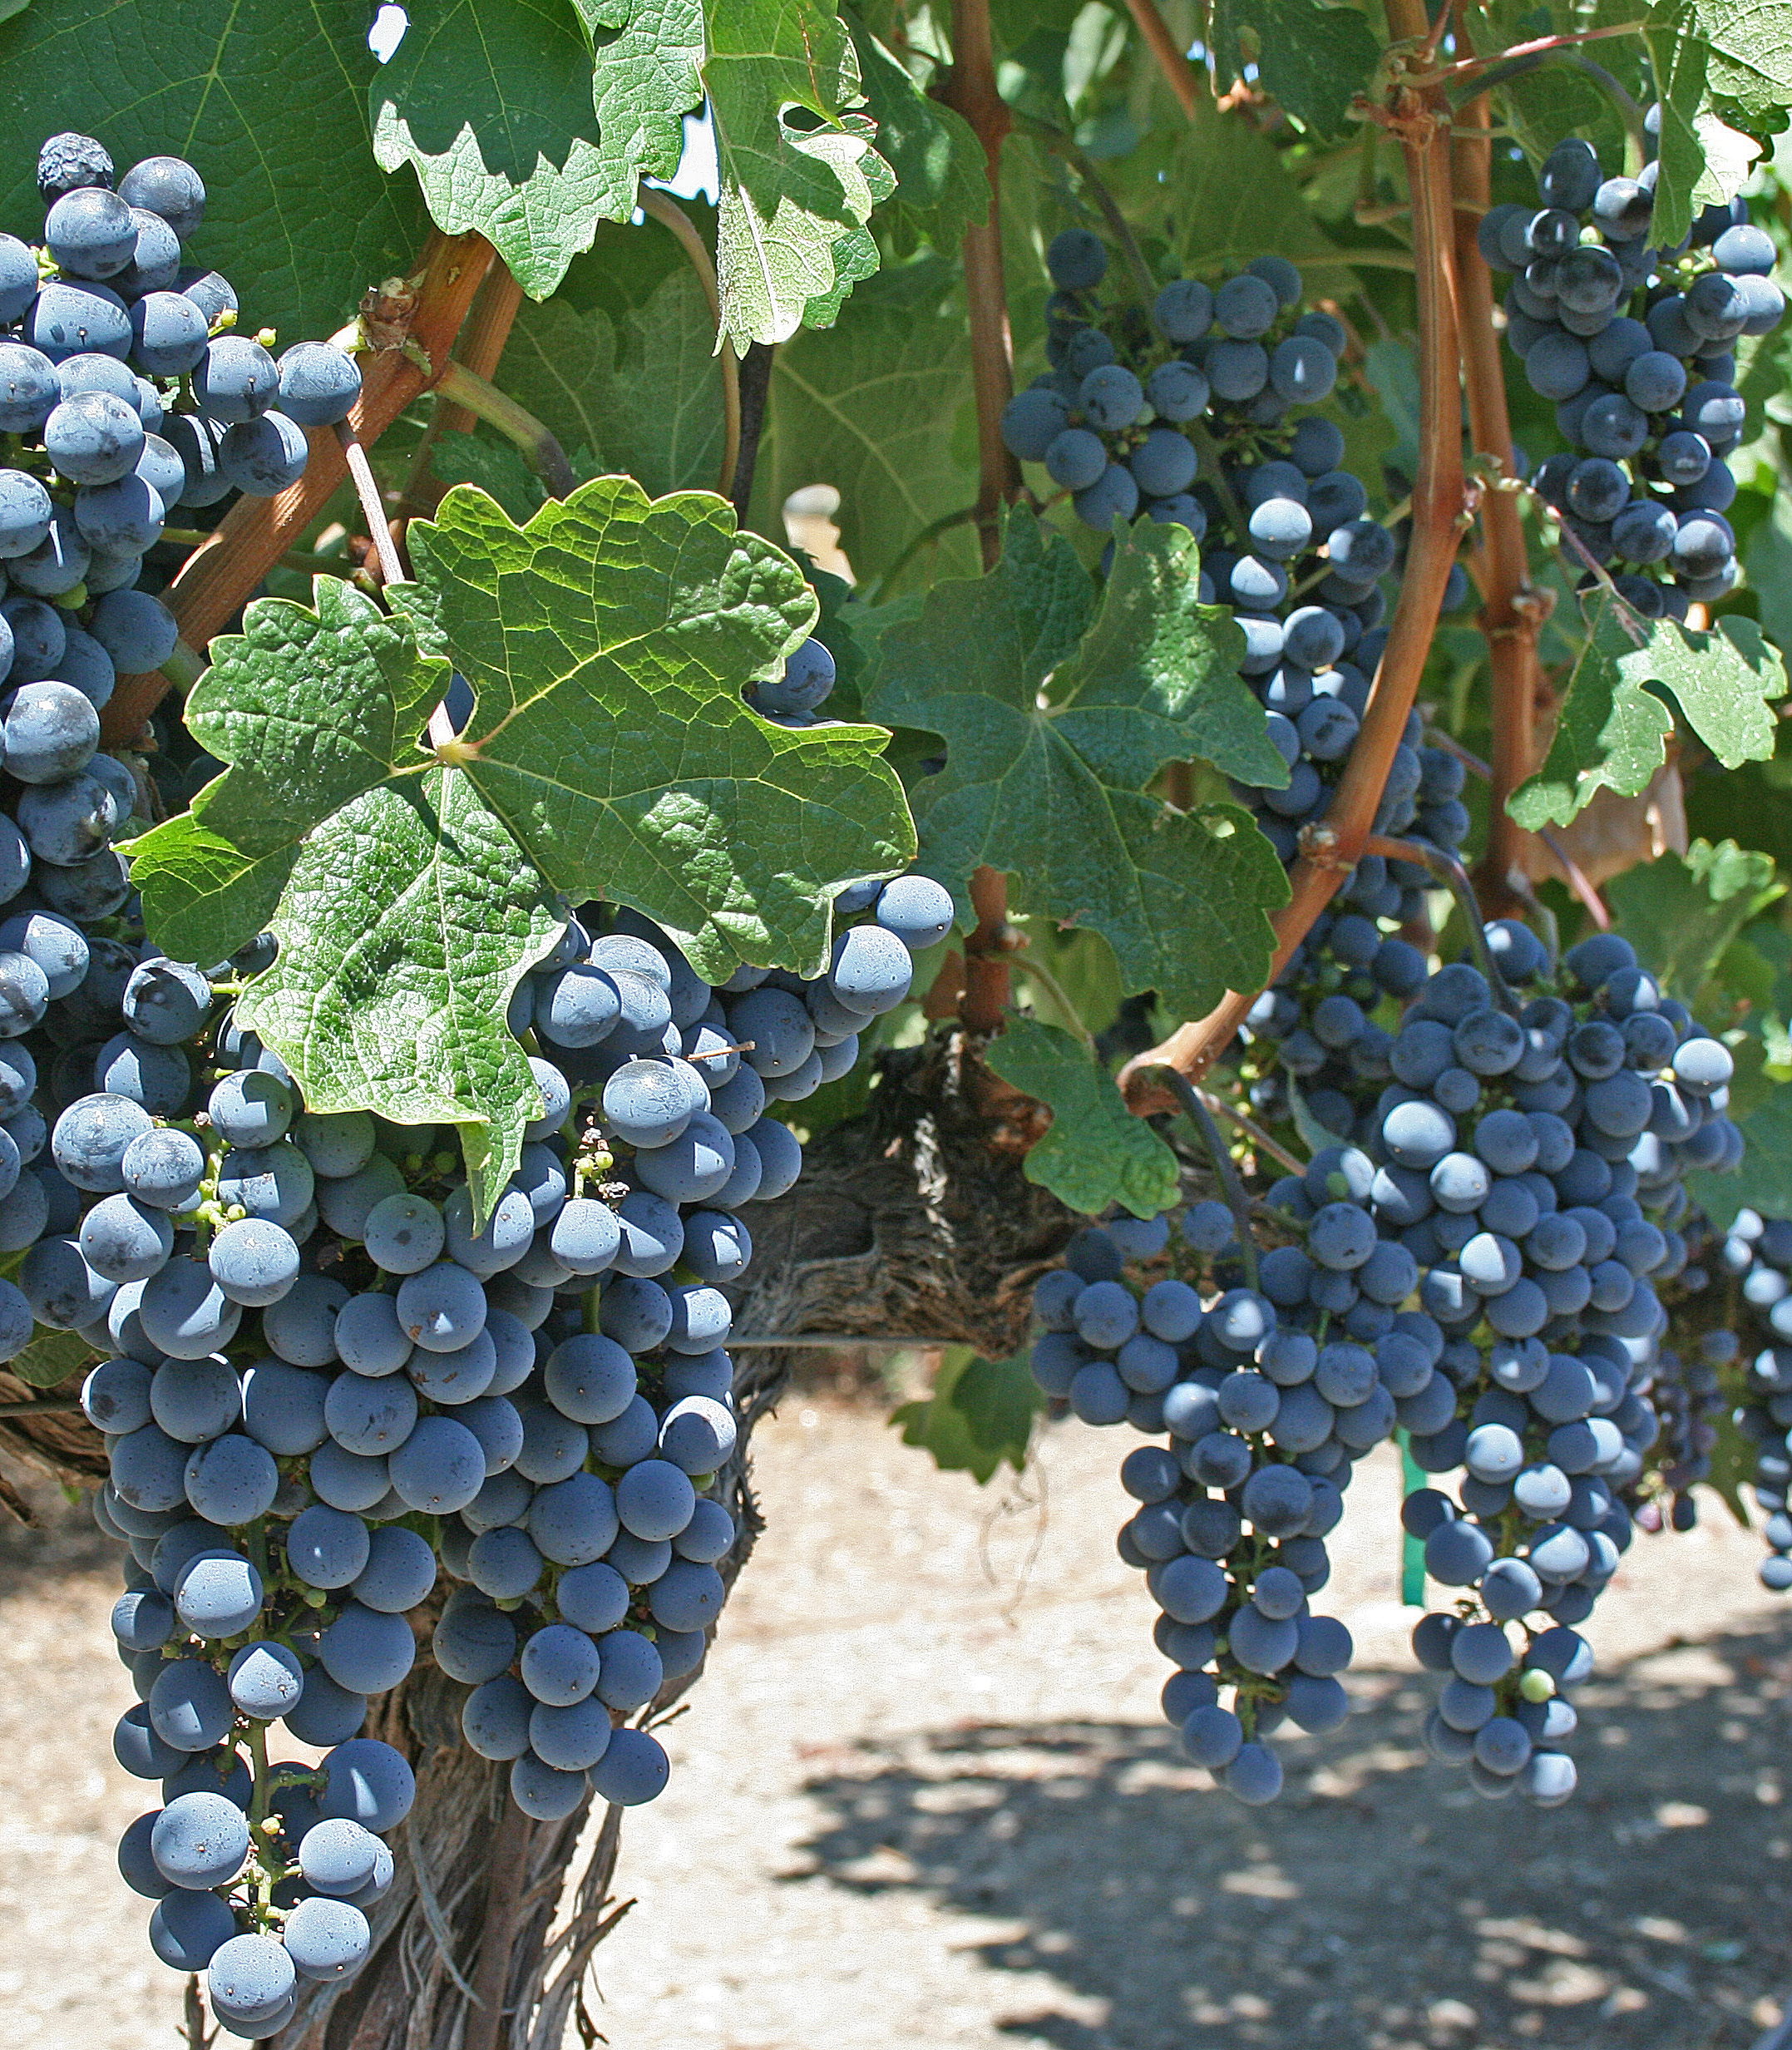 File:Grape Vines - Cliff Lede Winery jpg - Wikimedia Commons